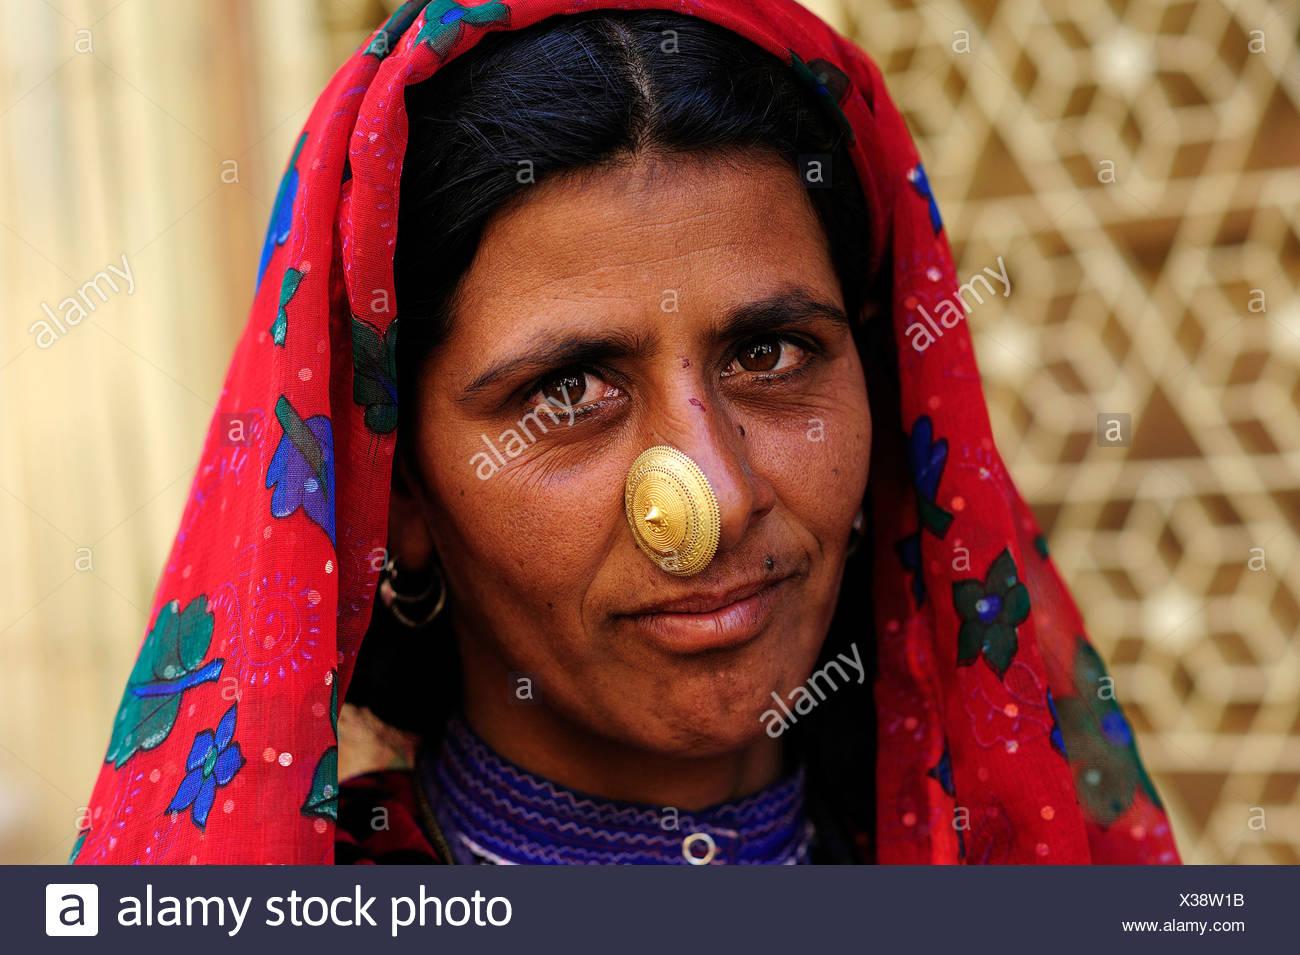 "Mujer india de los bishnoi"" grupo étnico con nariz de Oro Joyería, Jaisalmer, Rajasthan, India, Asia Imagen De Stock"